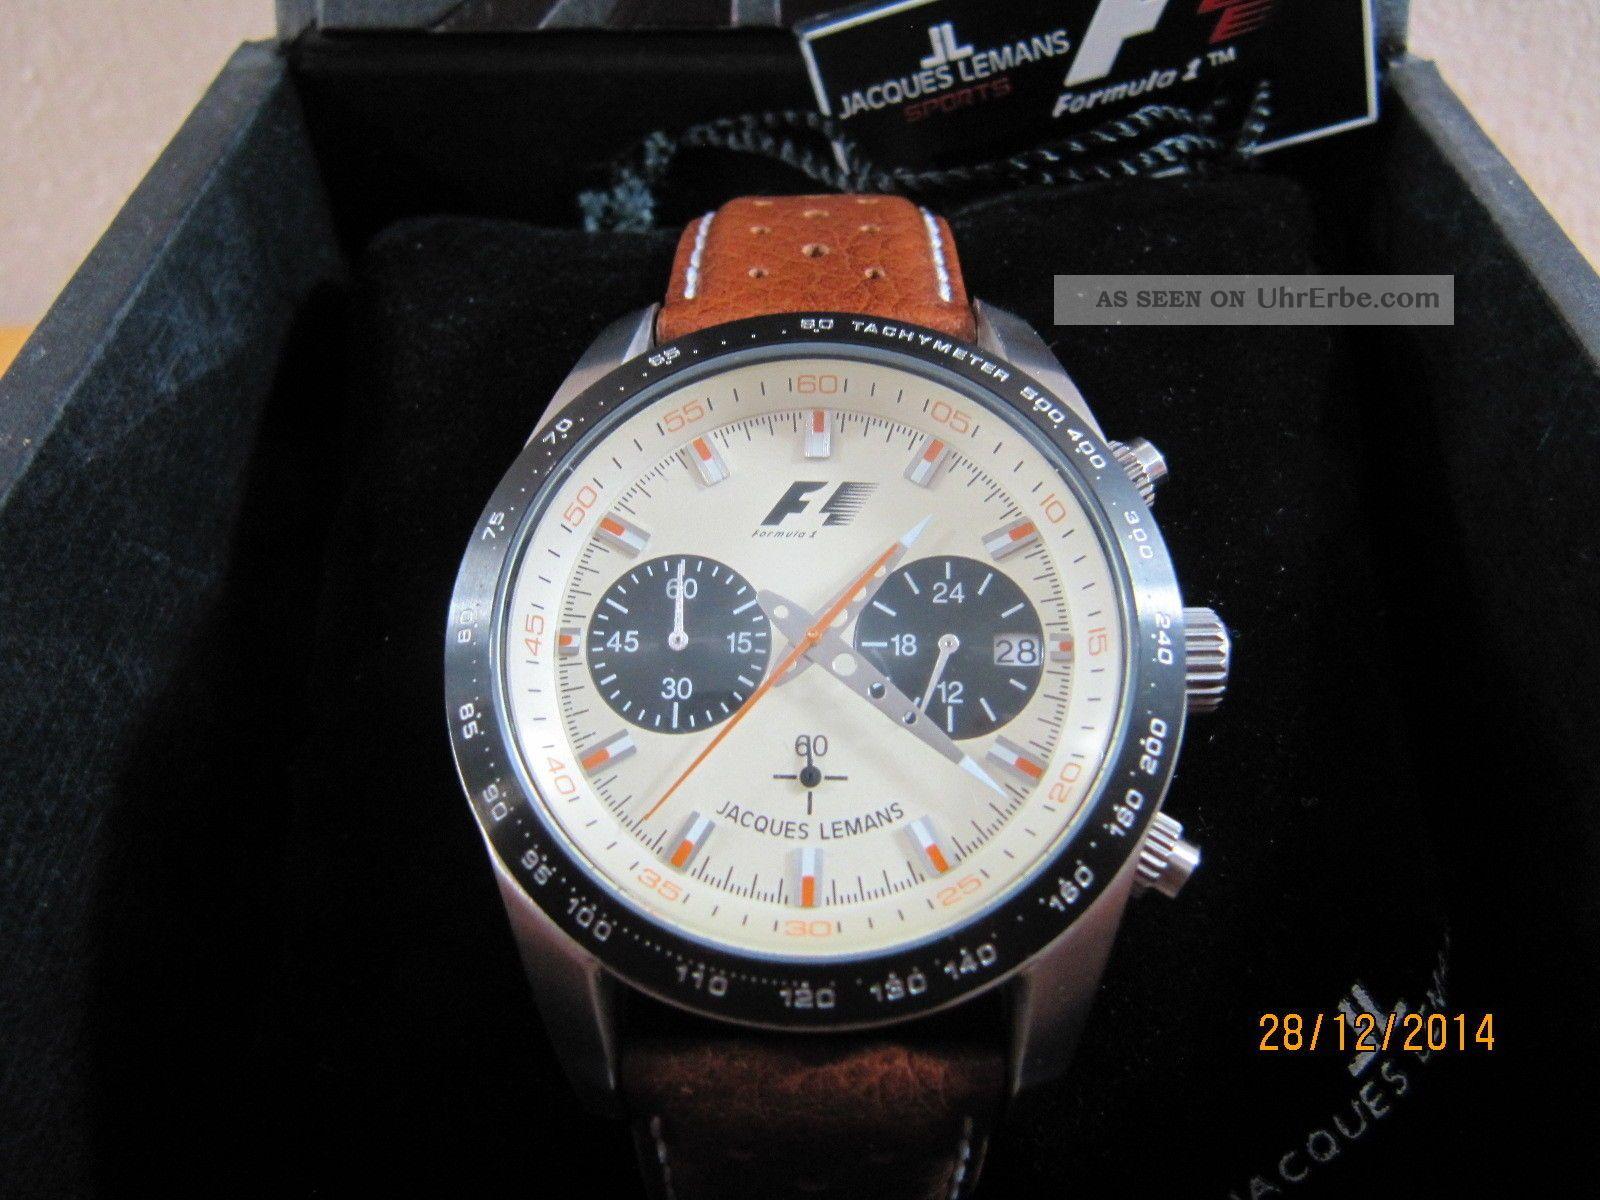 Jacques Lemans Formel 1 Retro 1970 5019 Herren Armbanduhr Uhr Selten Top Armbanduhren Bild